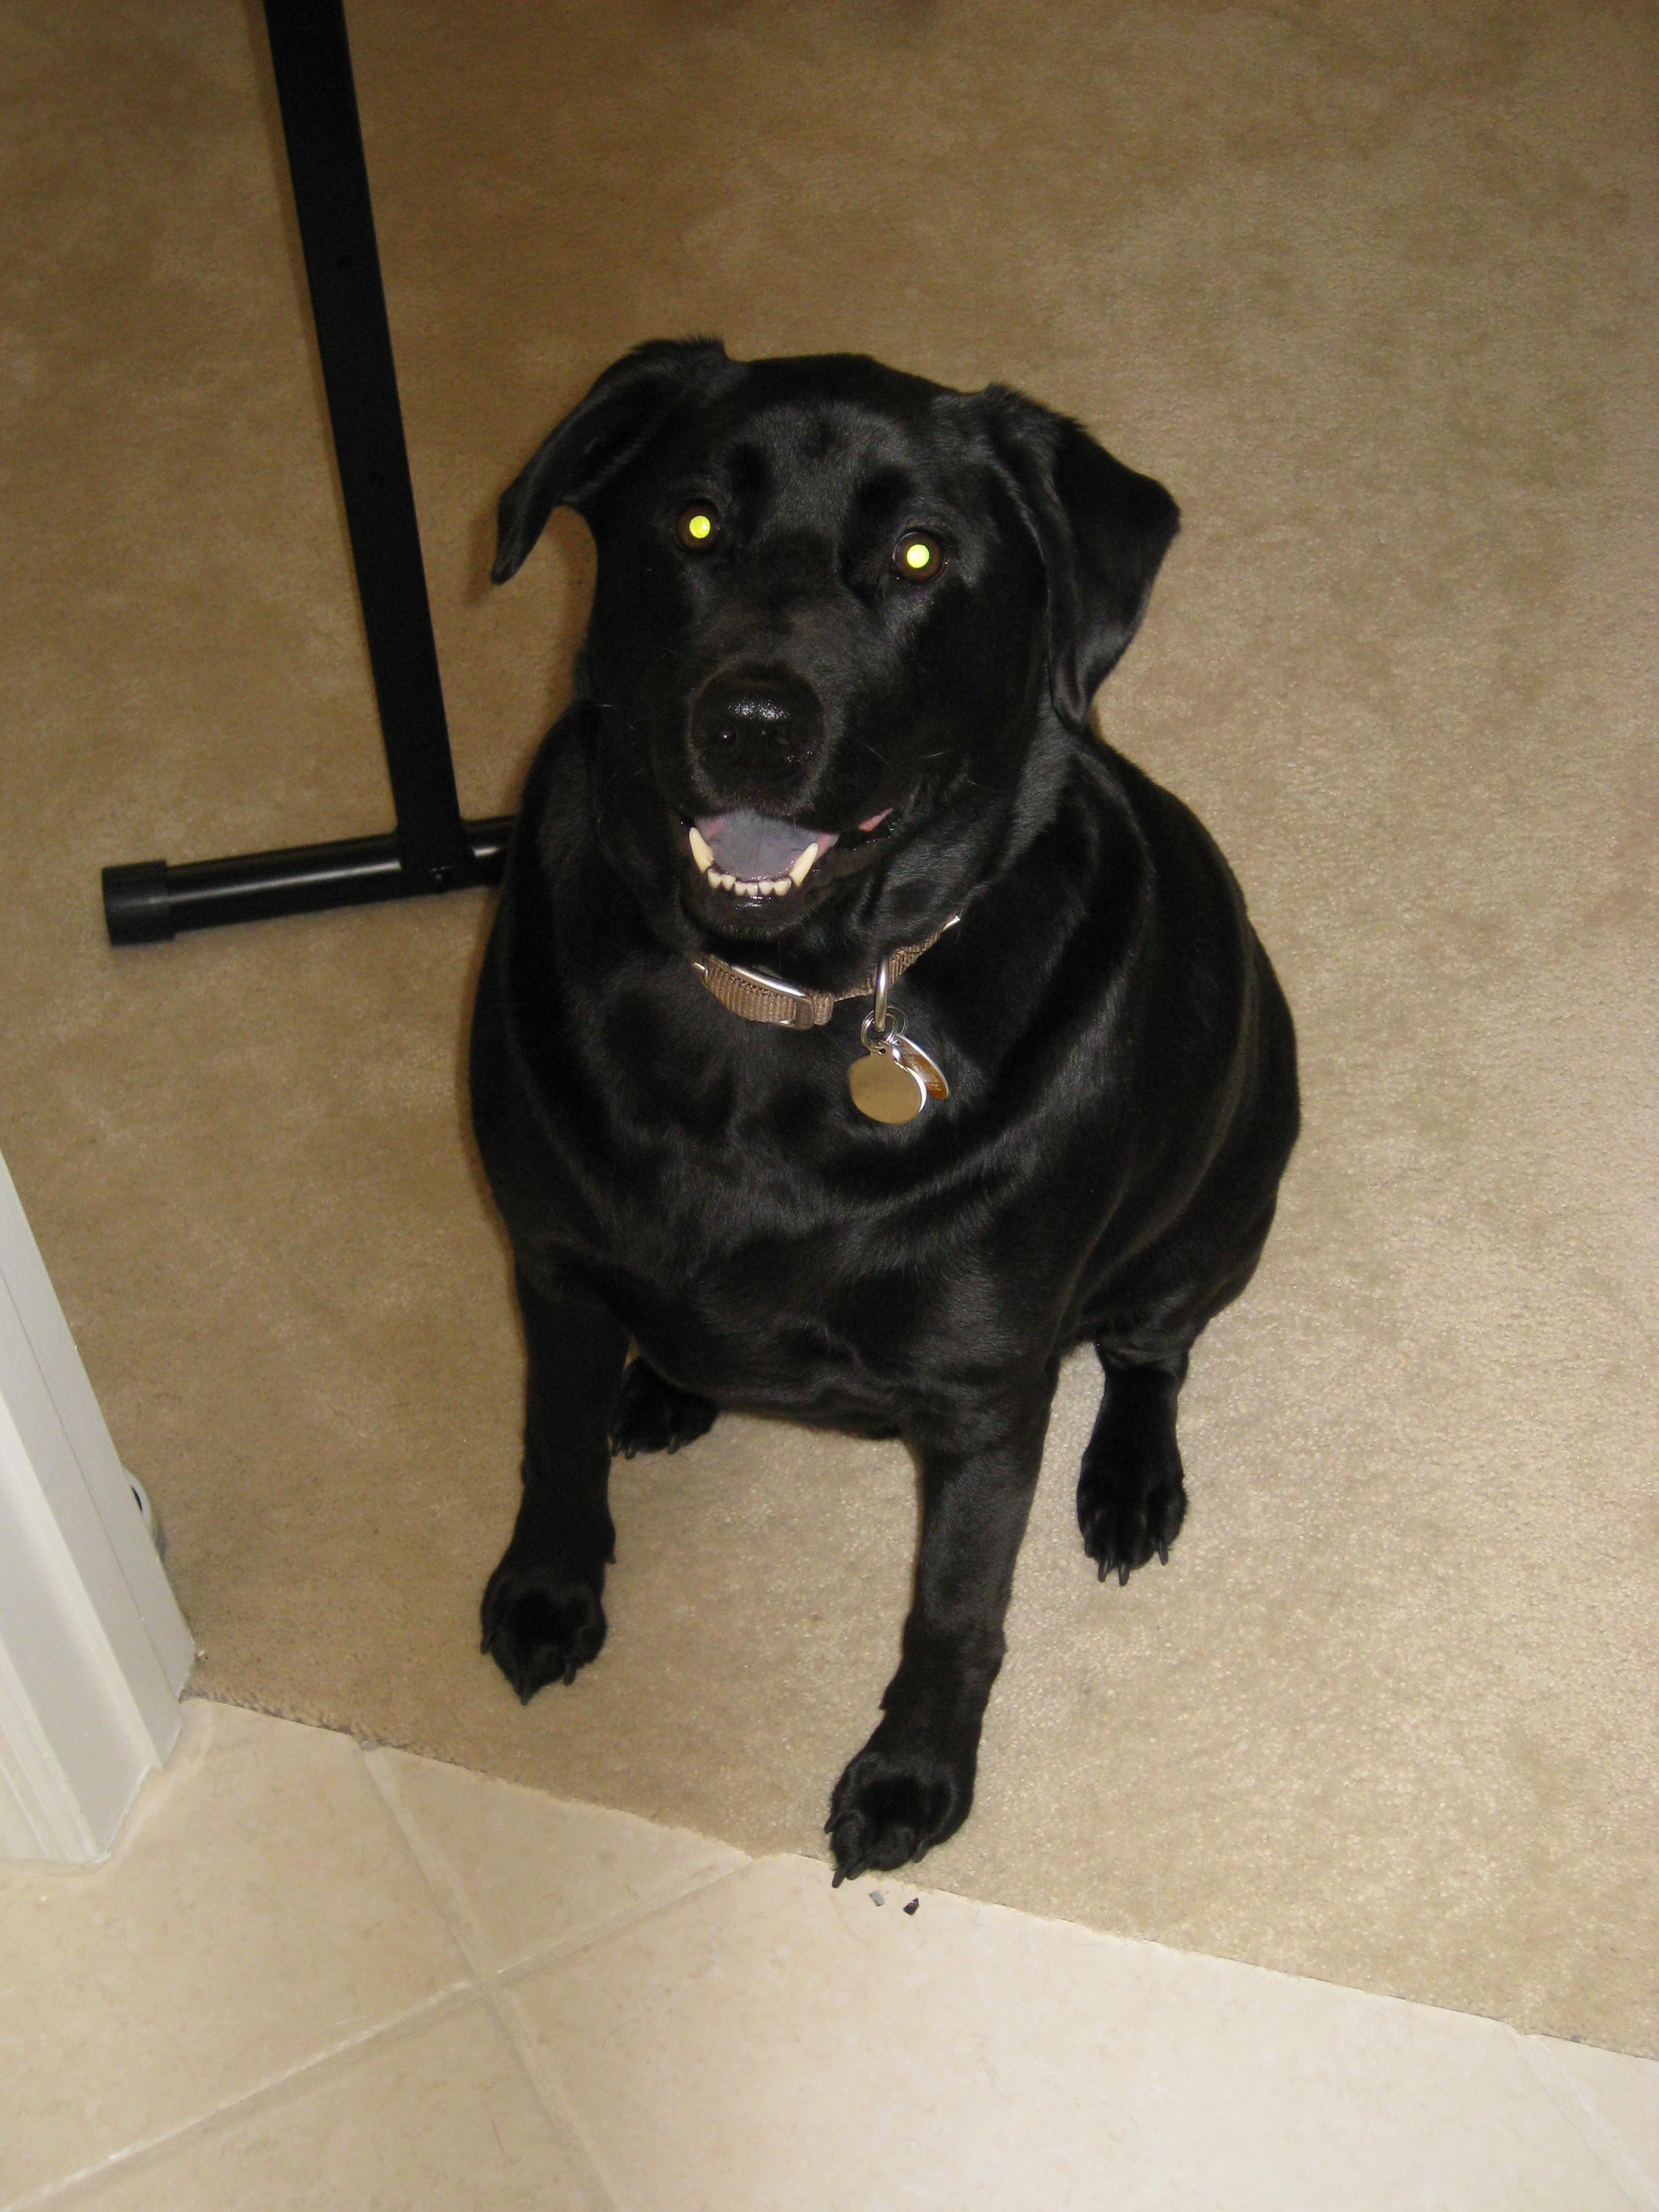 our first granddog - Rebel, the black lab